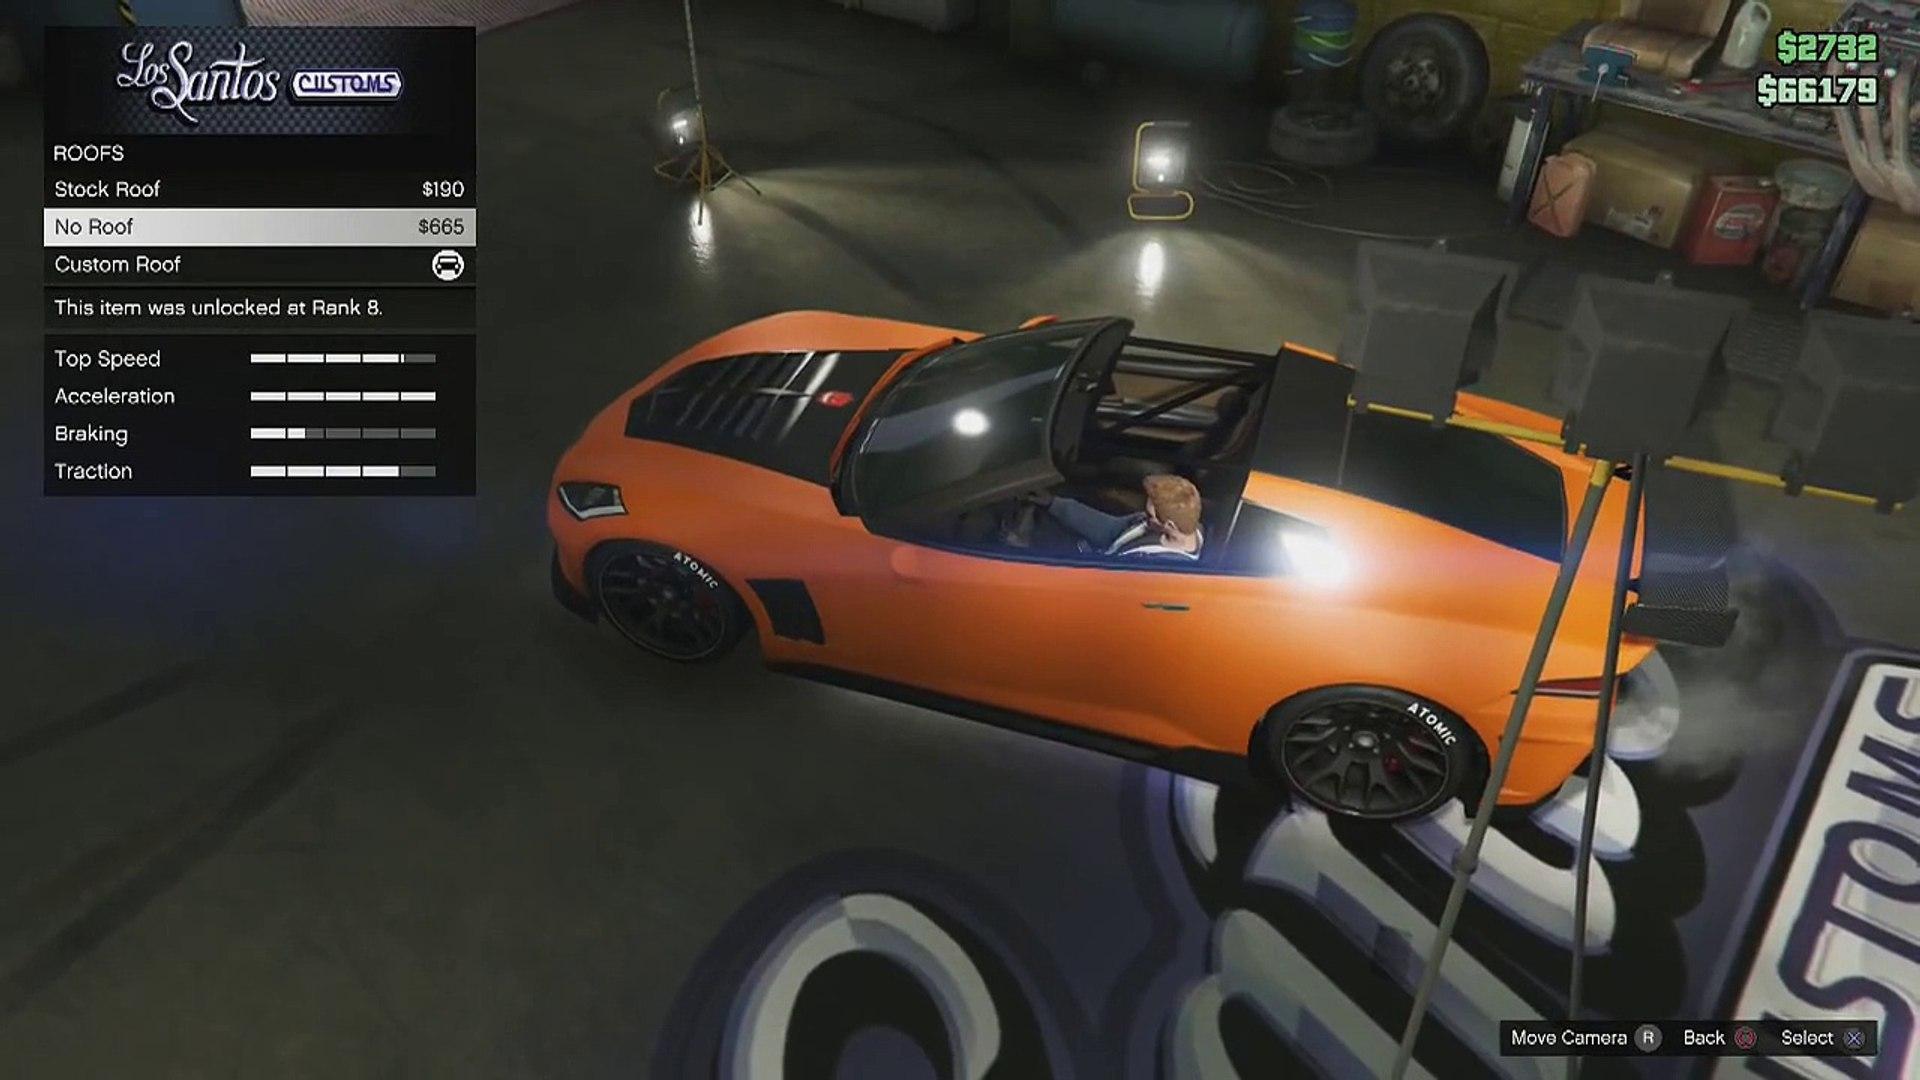 GTA 5 Online Best Cars to Customize in GTA 5 Online! (Secret Car  Customizations)